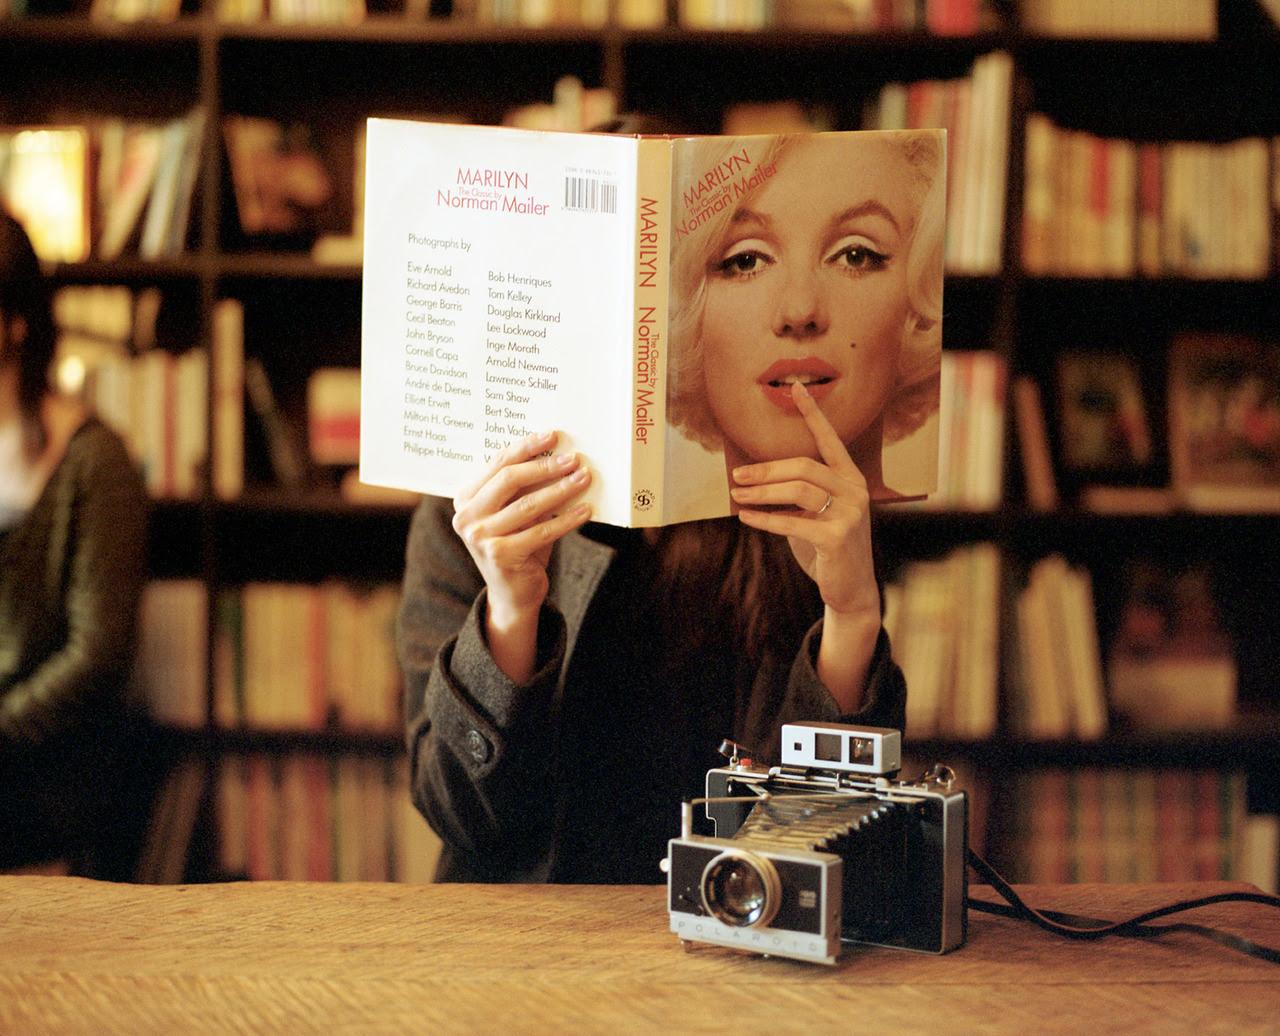 http://65.media.tumblr.com/tumblr_l0g64unw861qzsgryo1_1280.jpg